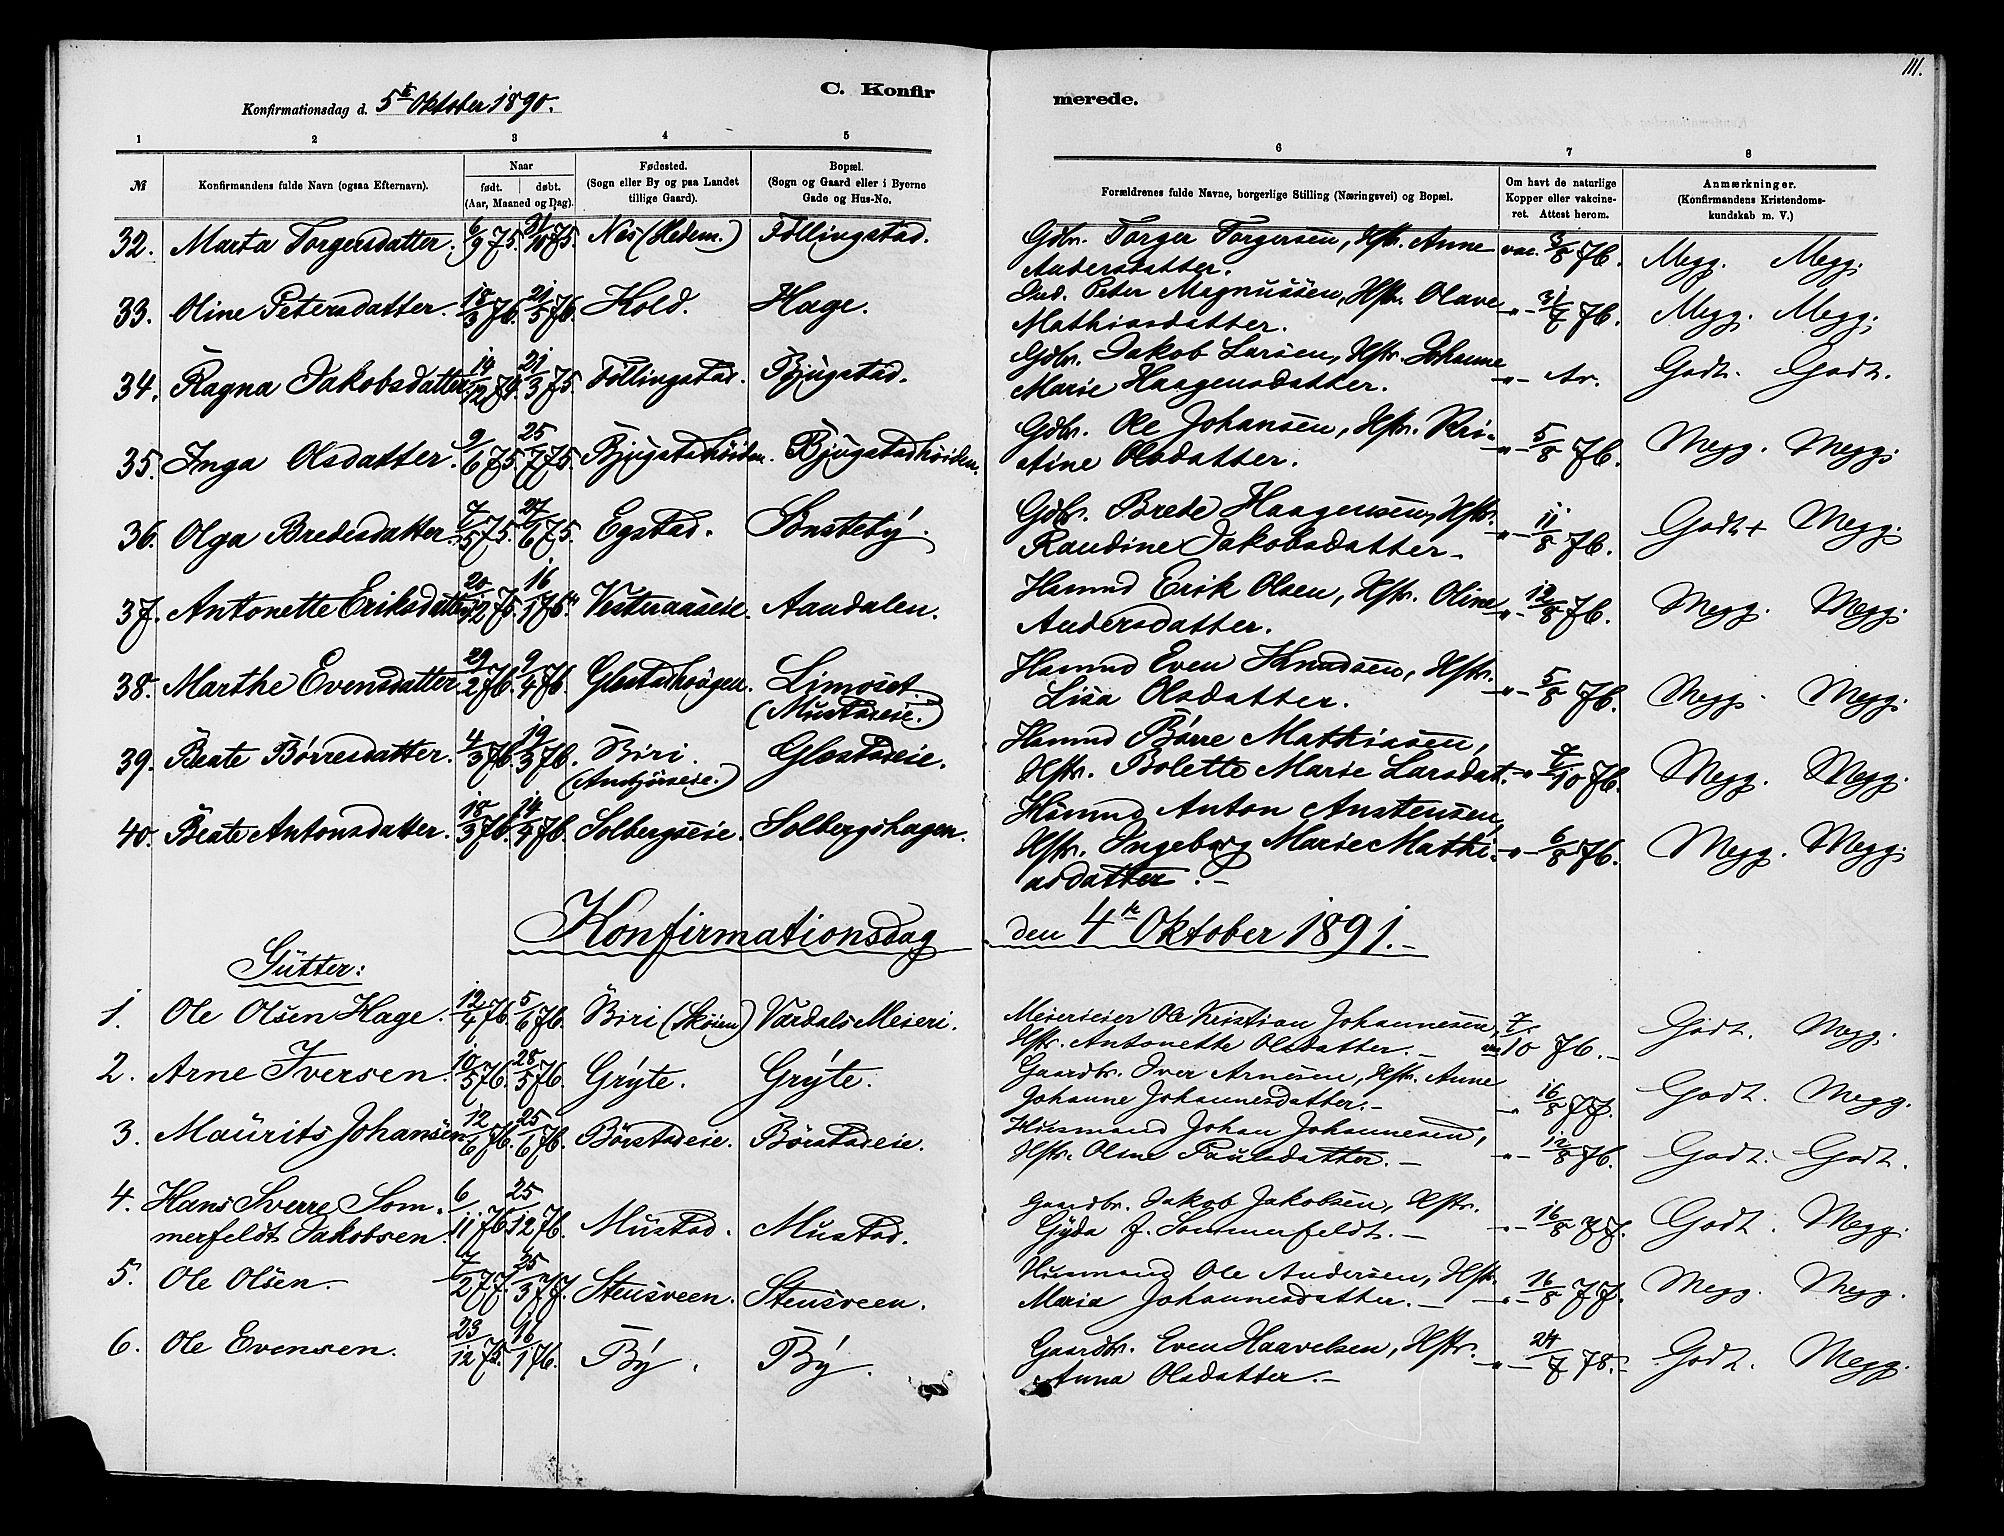 SAH, Vardal prestekontor, H/Ha/Haa/L0010: Ministerialbok nr. 10, 1878-1893, s. 111